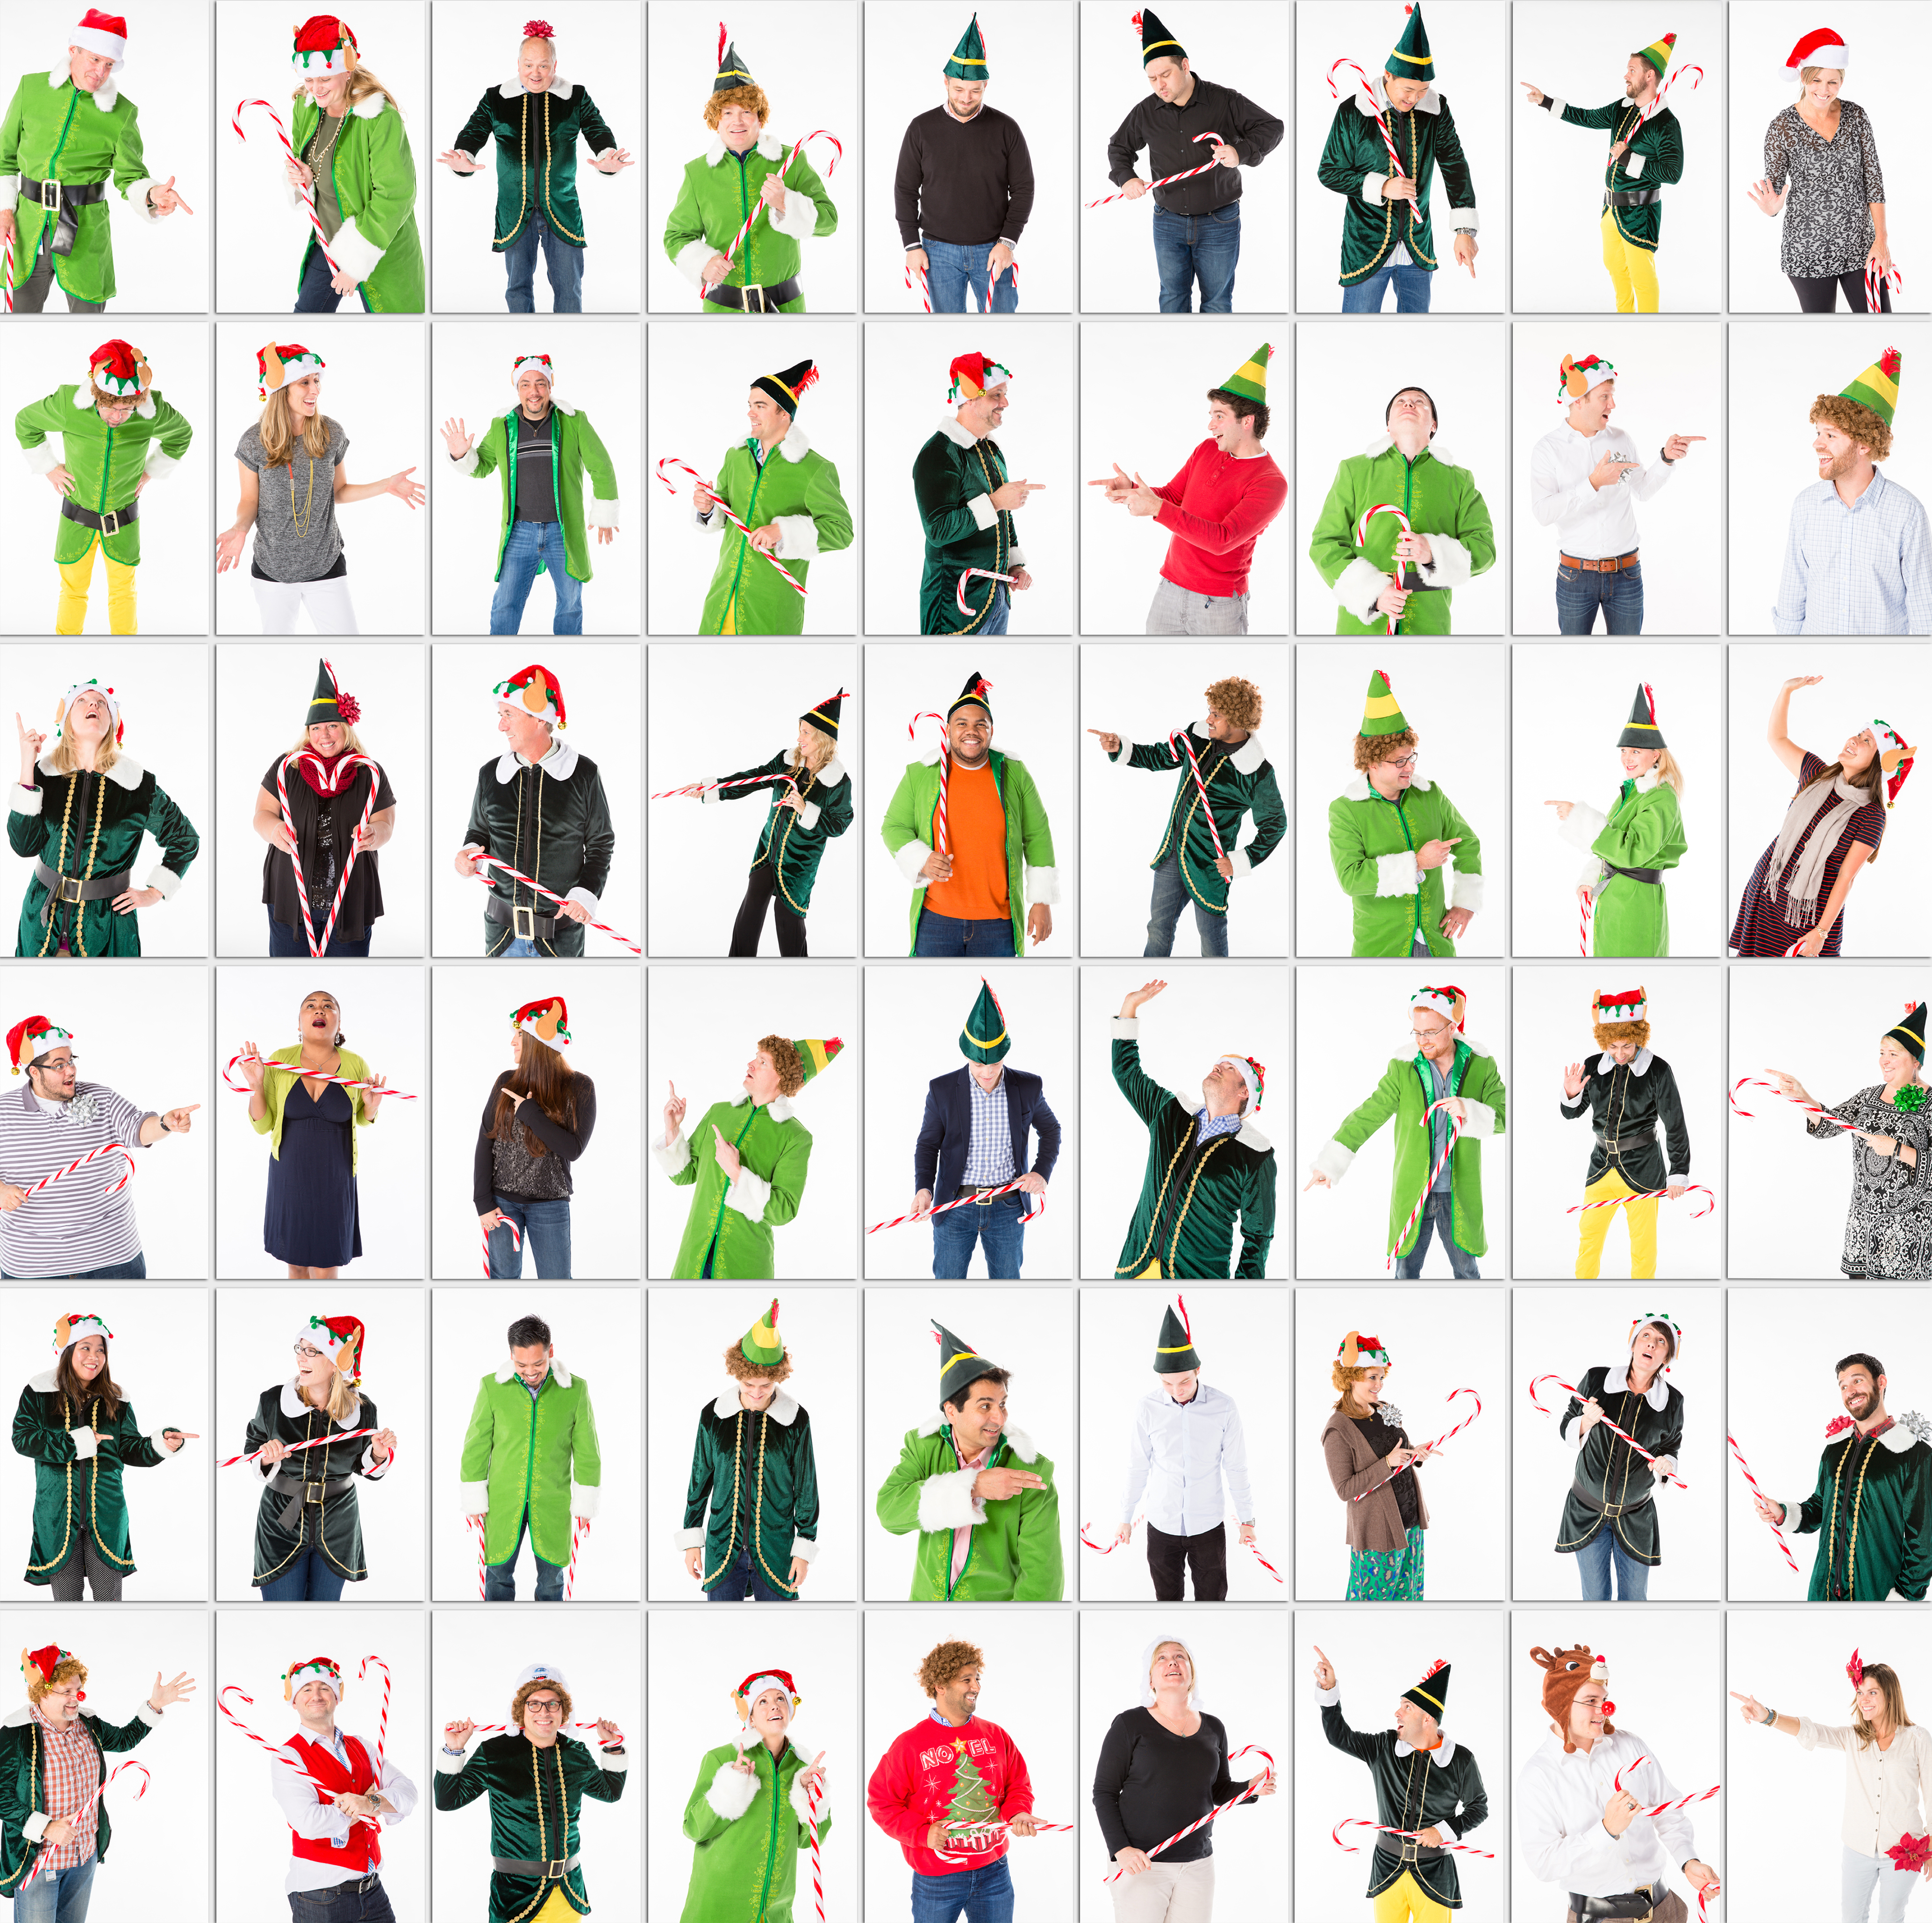 PITSP_MSFT Holiday_Brady Bunch Style_MULTI